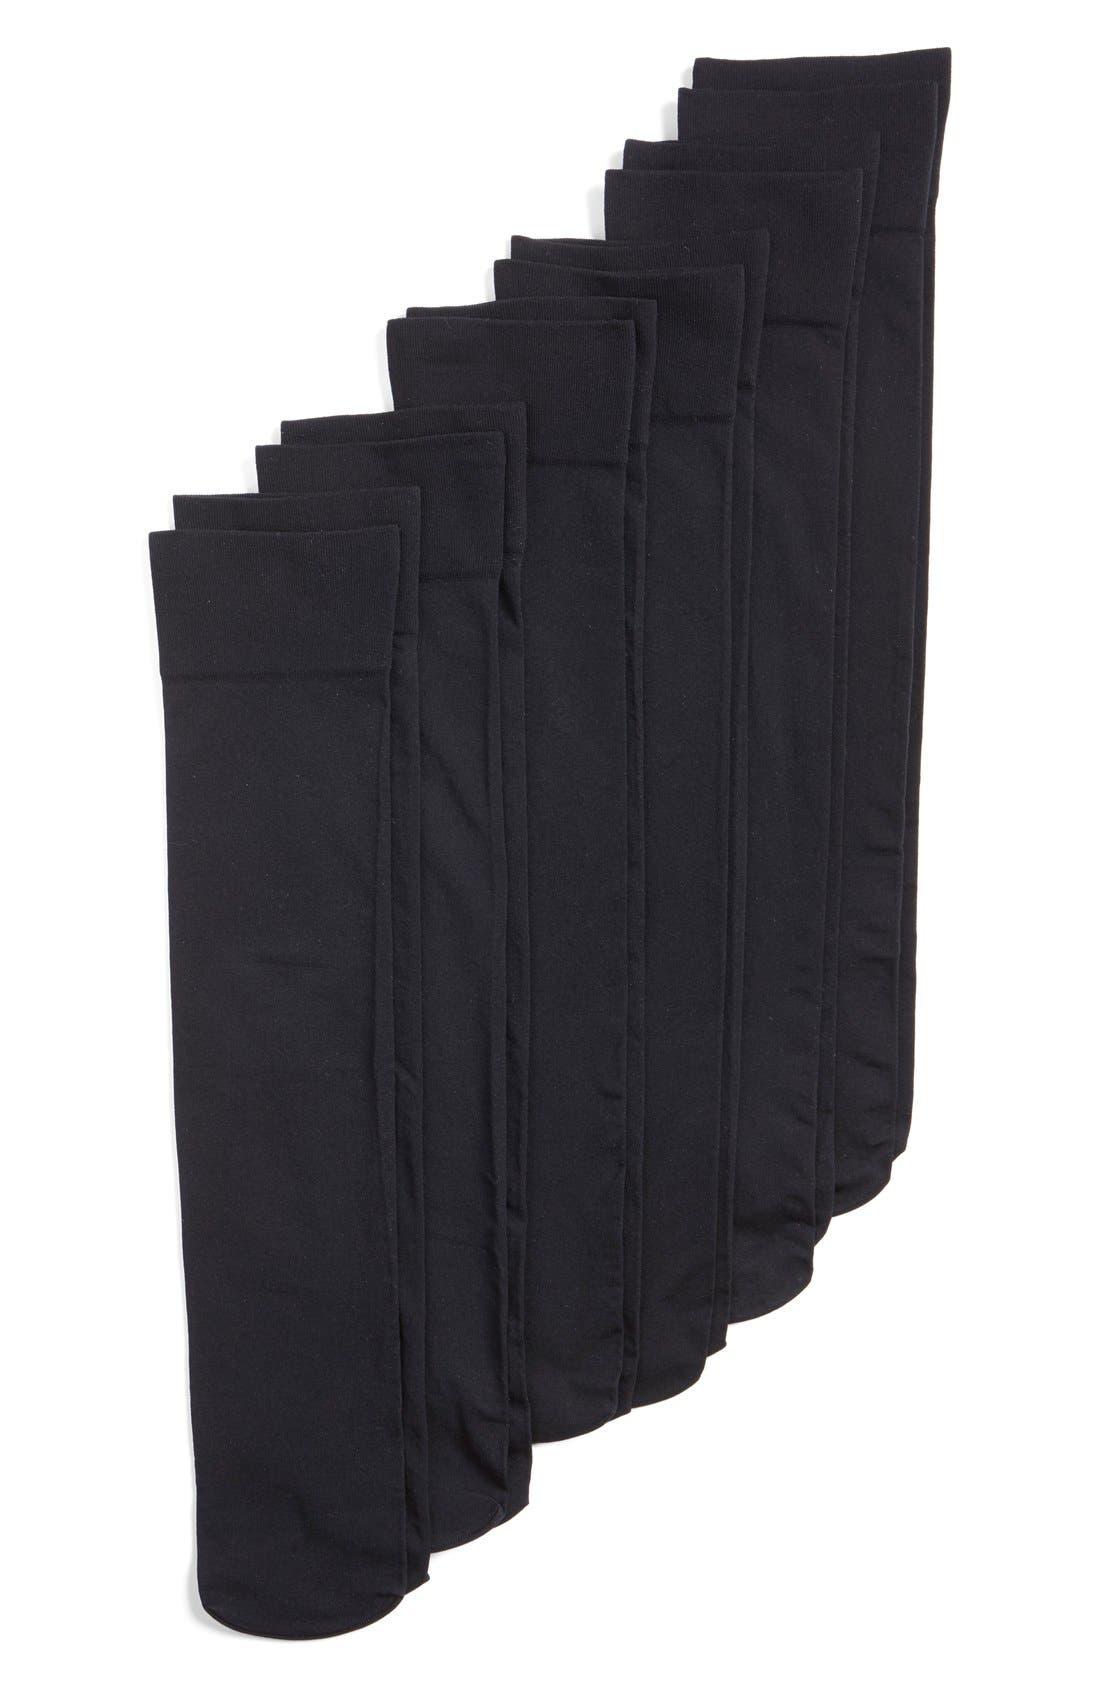 6-Pack Opaque Trouser Socks,                             Main thumbnail 1, color,                             BLACK